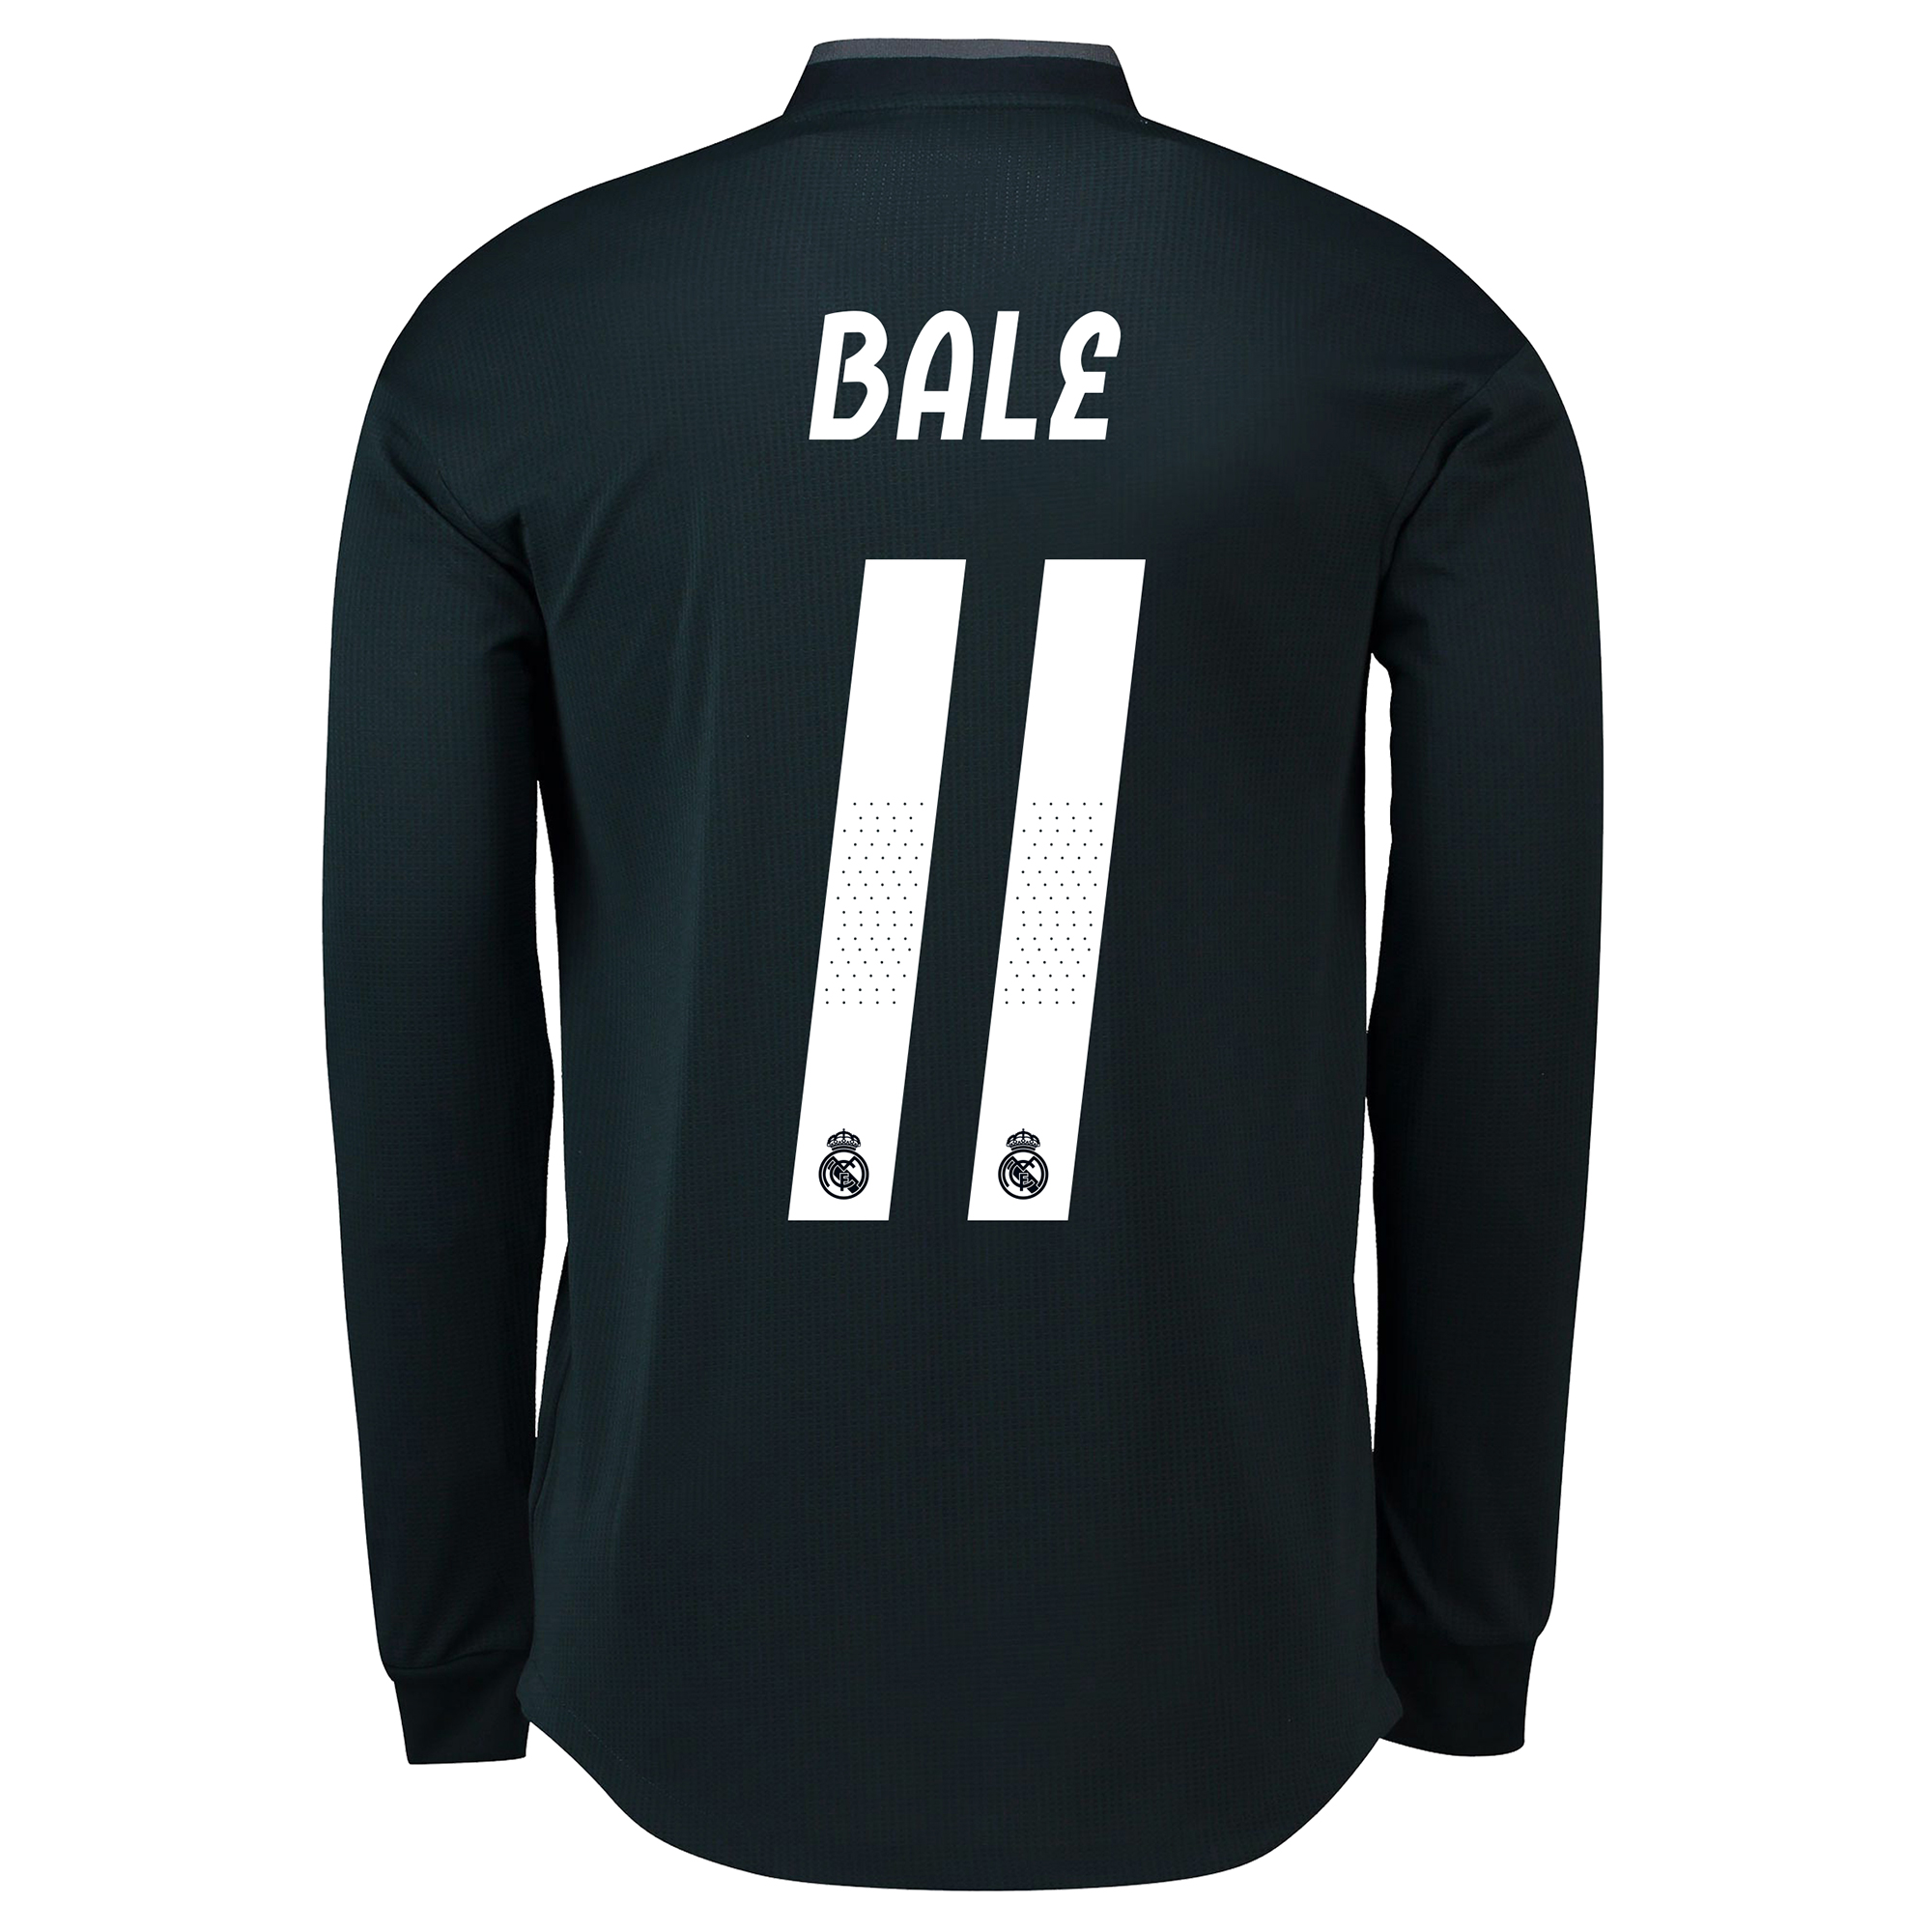 Image of Real Madrid Away Adi Zero Shirt 2018-19 - Long Sleeve with Bale 11 printing